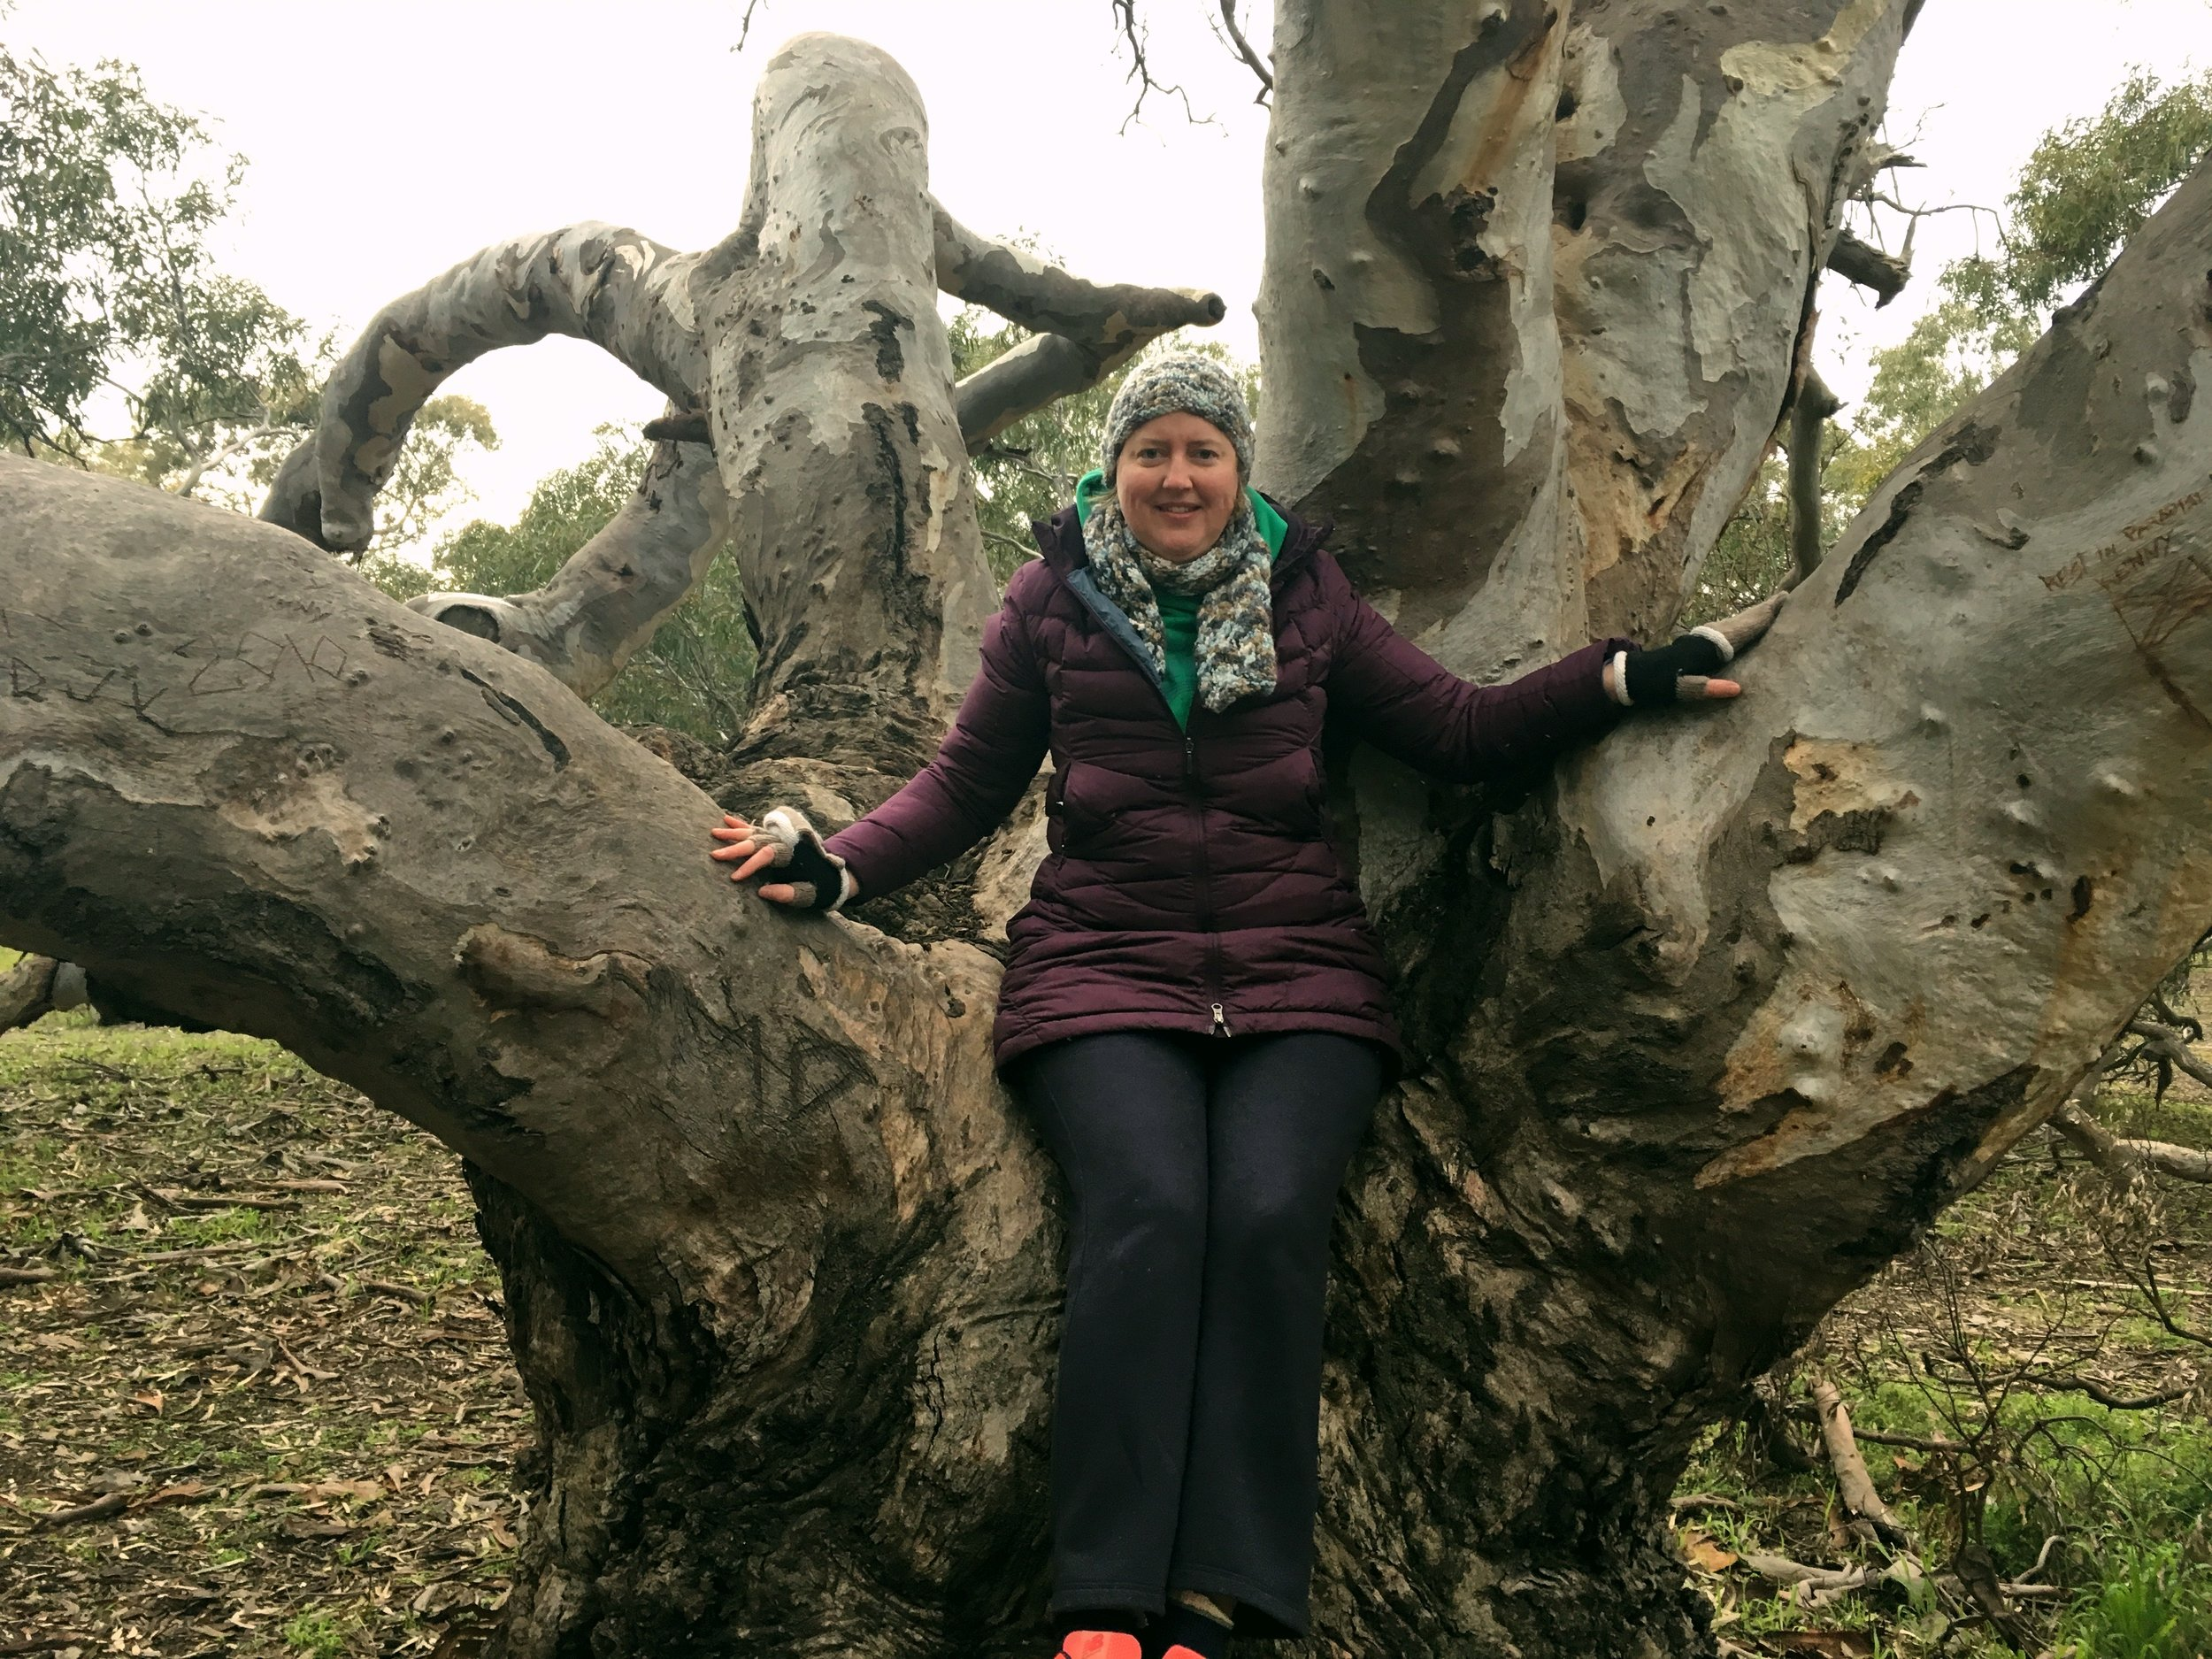 EMMA-JANE AT THE TREE